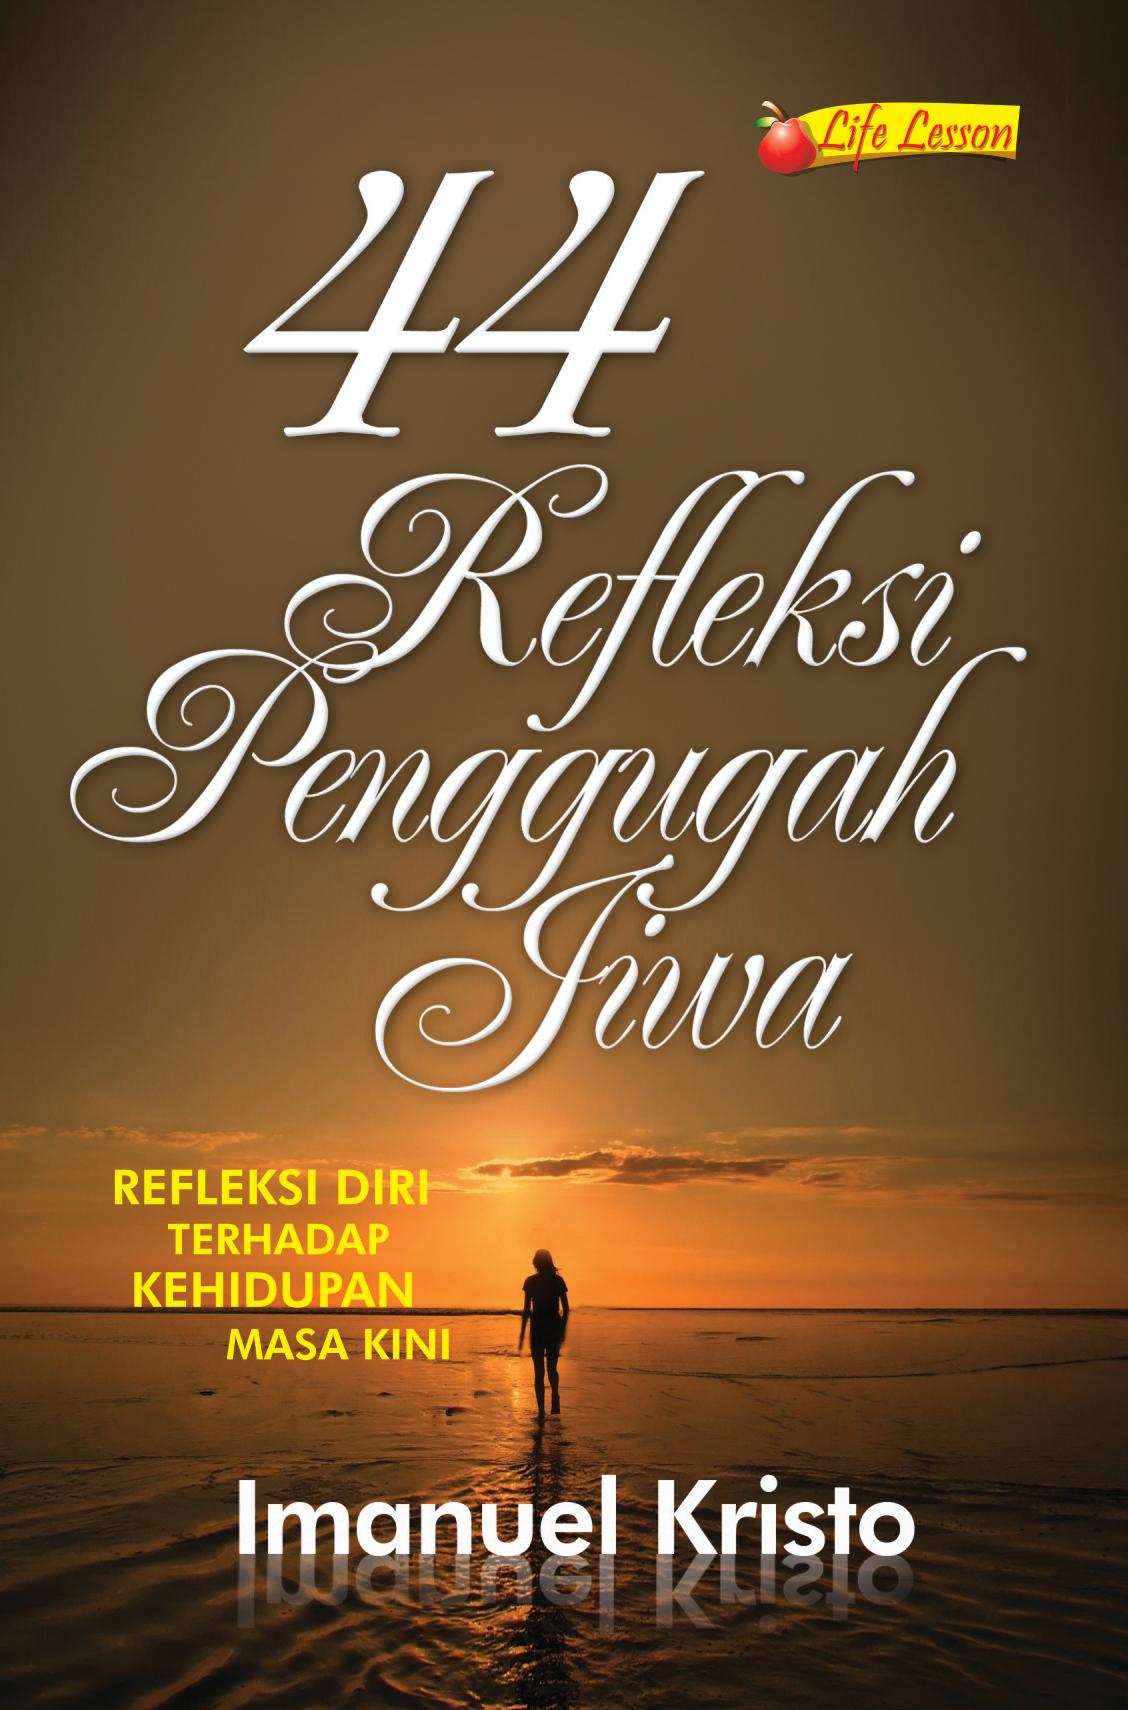 44 refleksi penggugah jiwa, refleksi diri terhadap kehidupan masa kini [sumber elektronis]